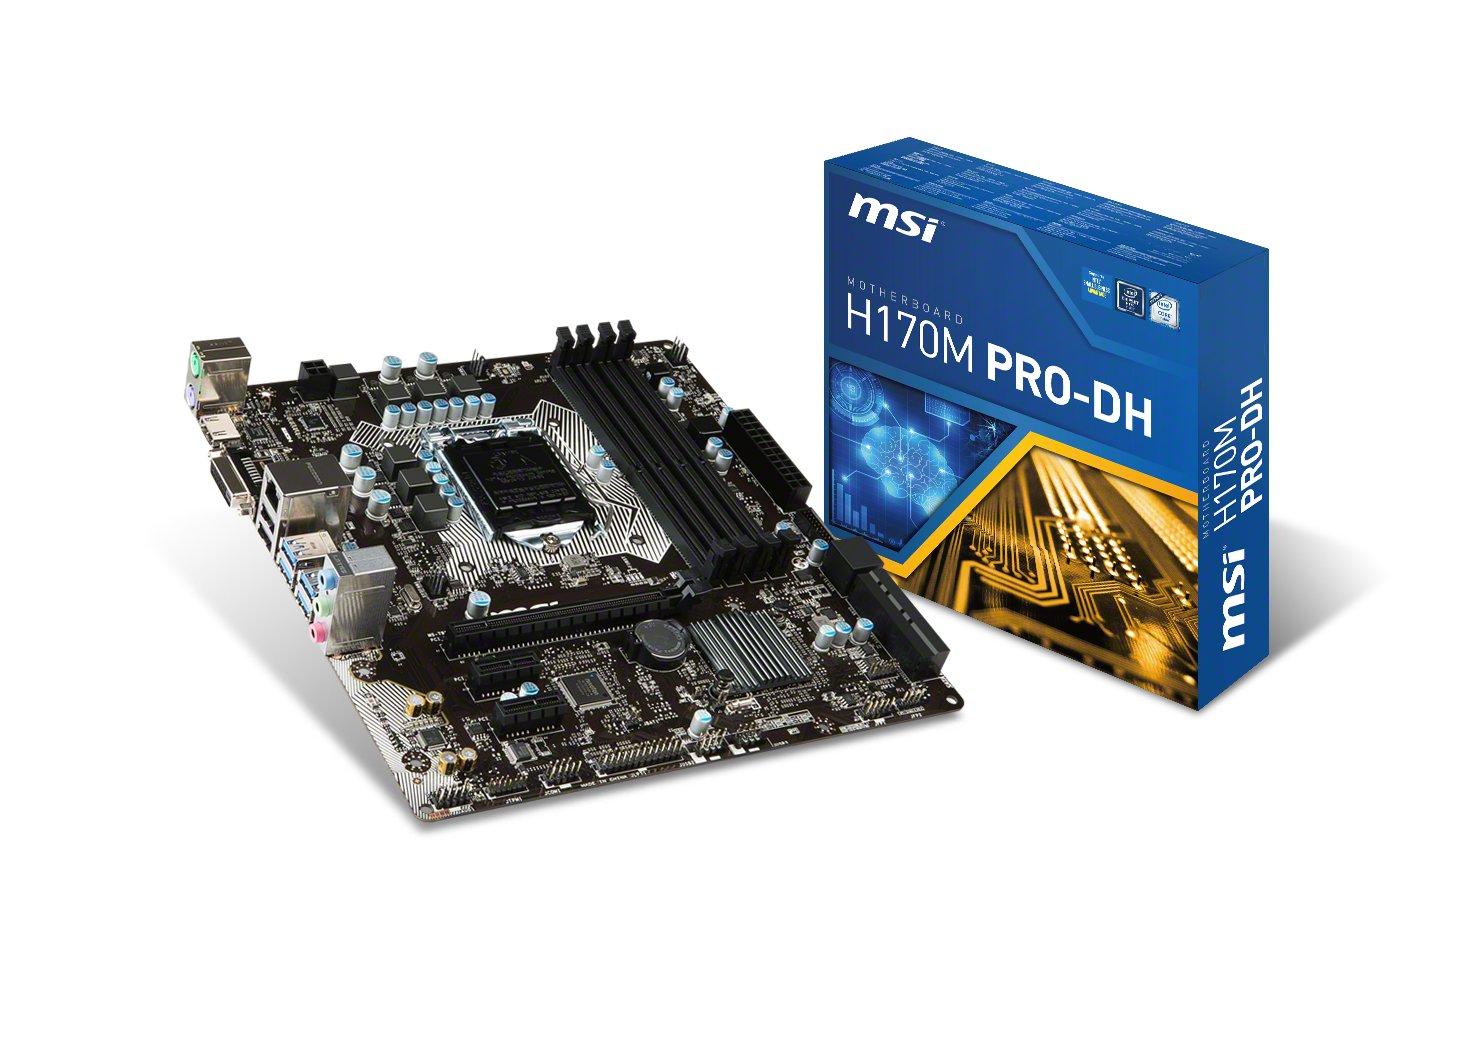 MSI H170M Pro-DH